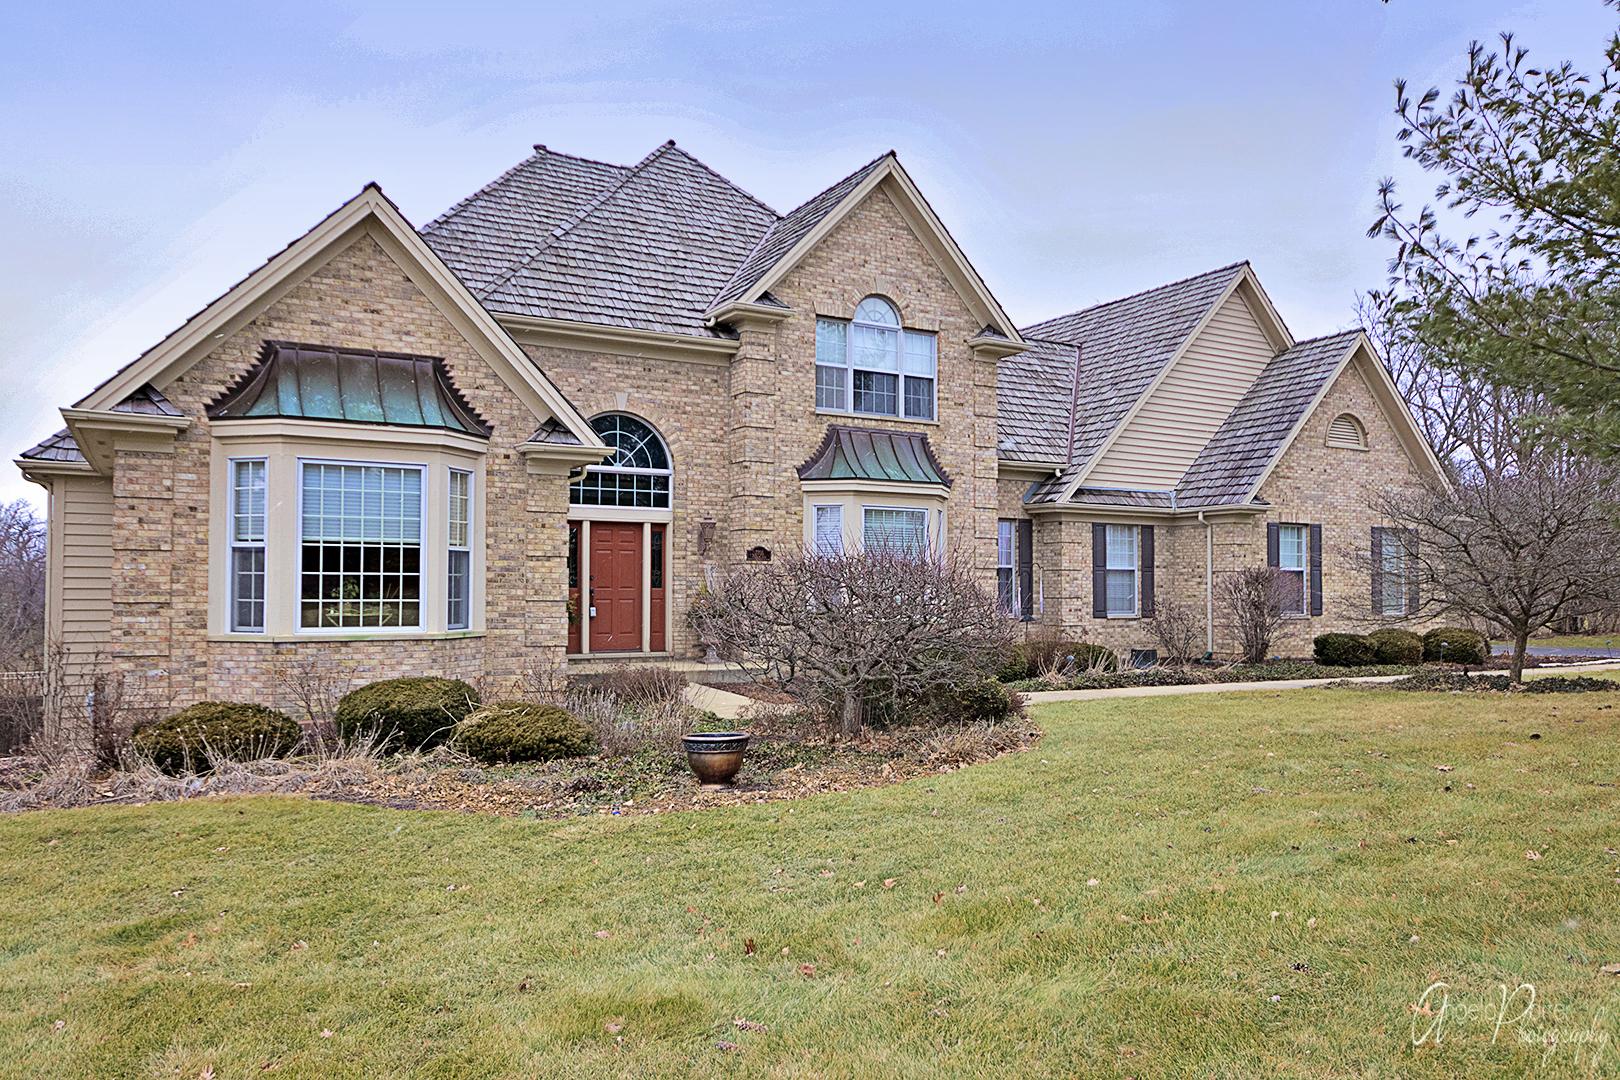 Property for sale at 7705 Burr Oak Drive, Mchenry,  IL 60050